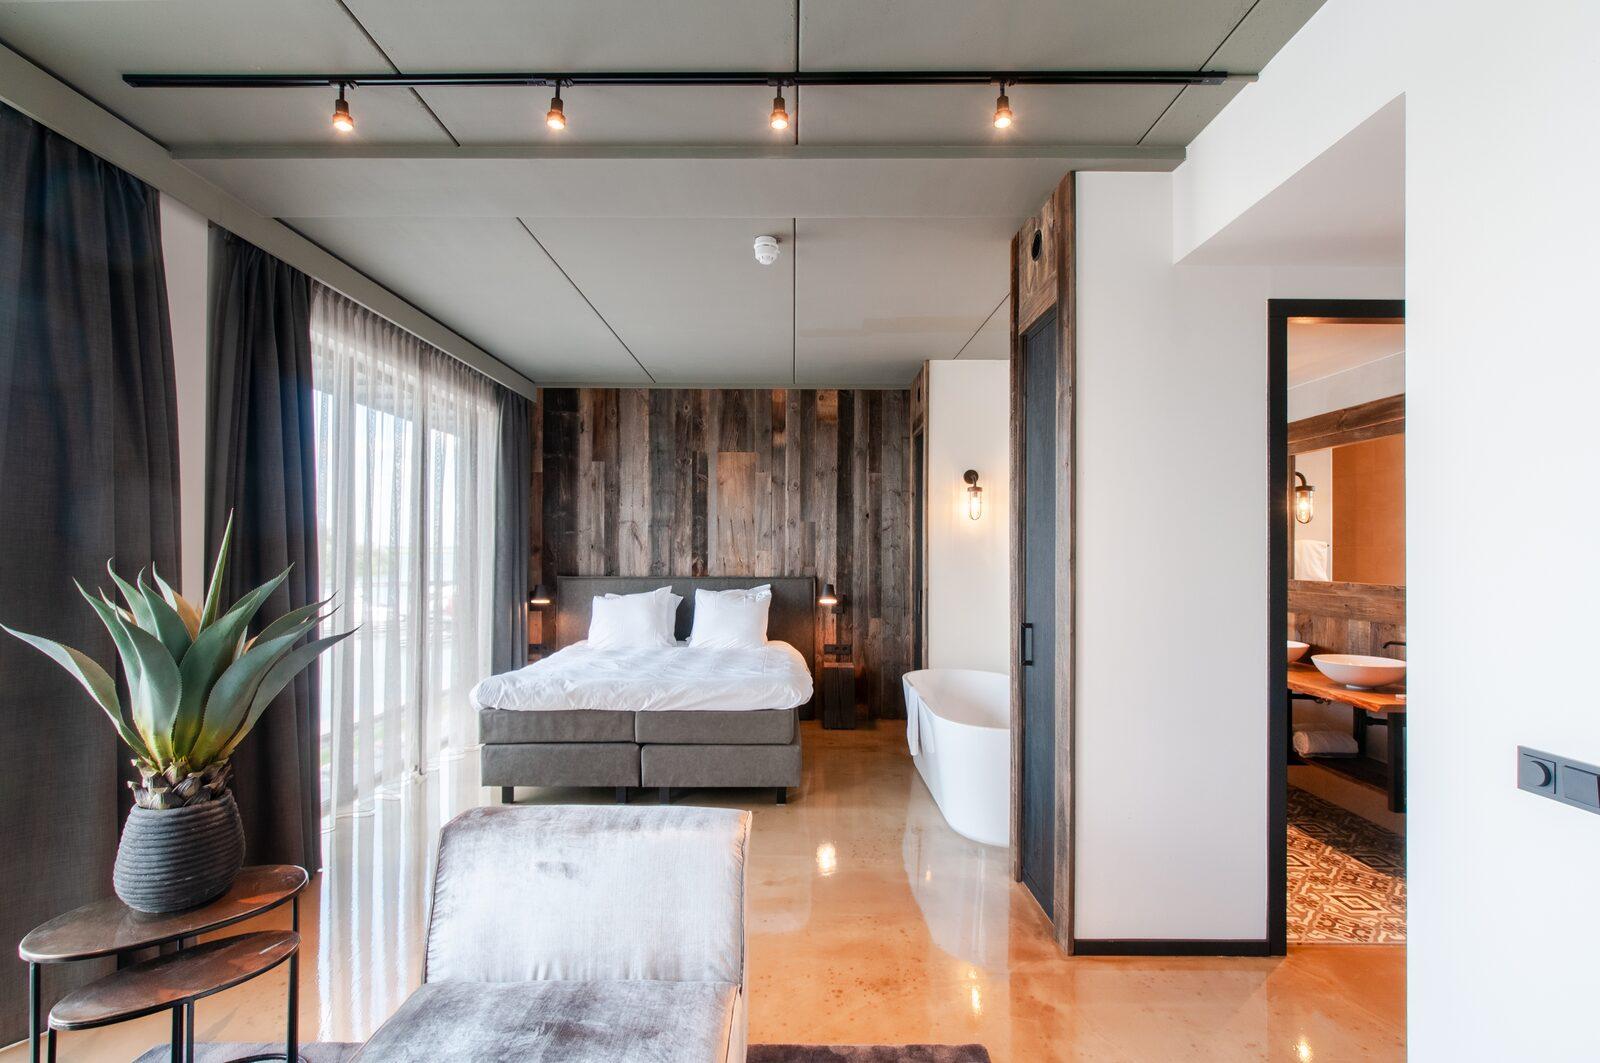 Hotel in Tholen Zeeland